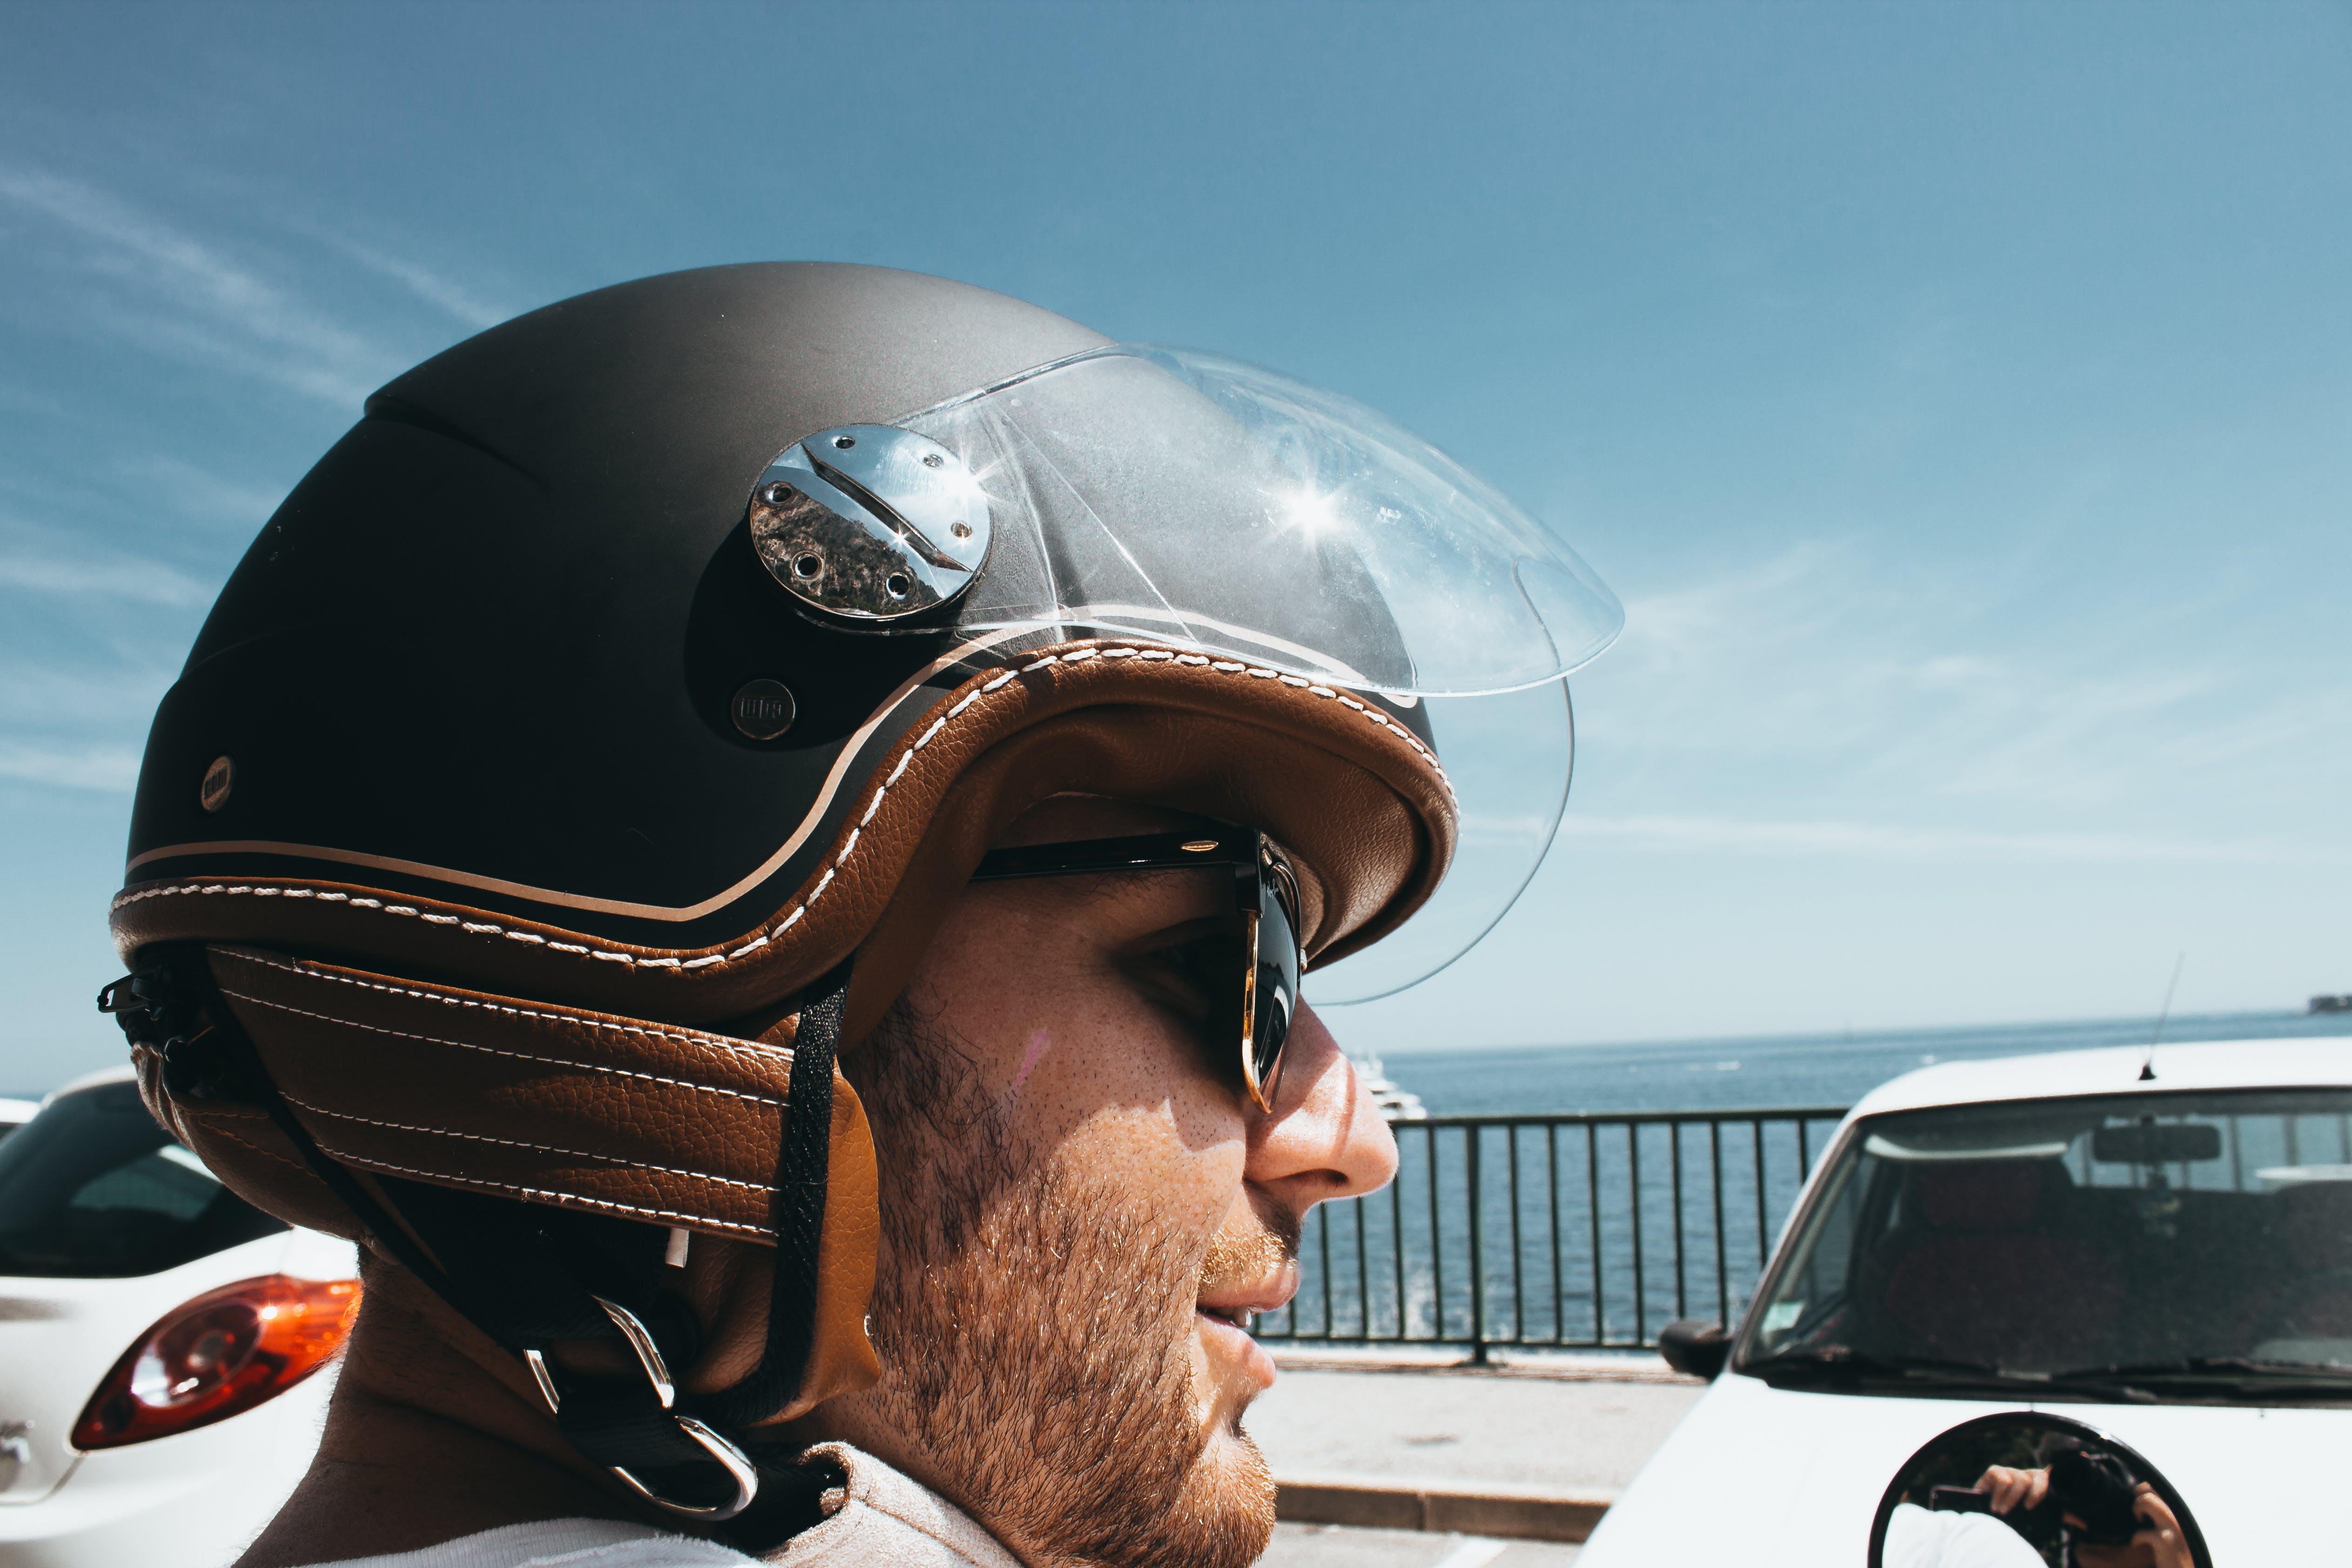 Man Wearing Black-and-brown Half-face Helmet and Black Sunglasses